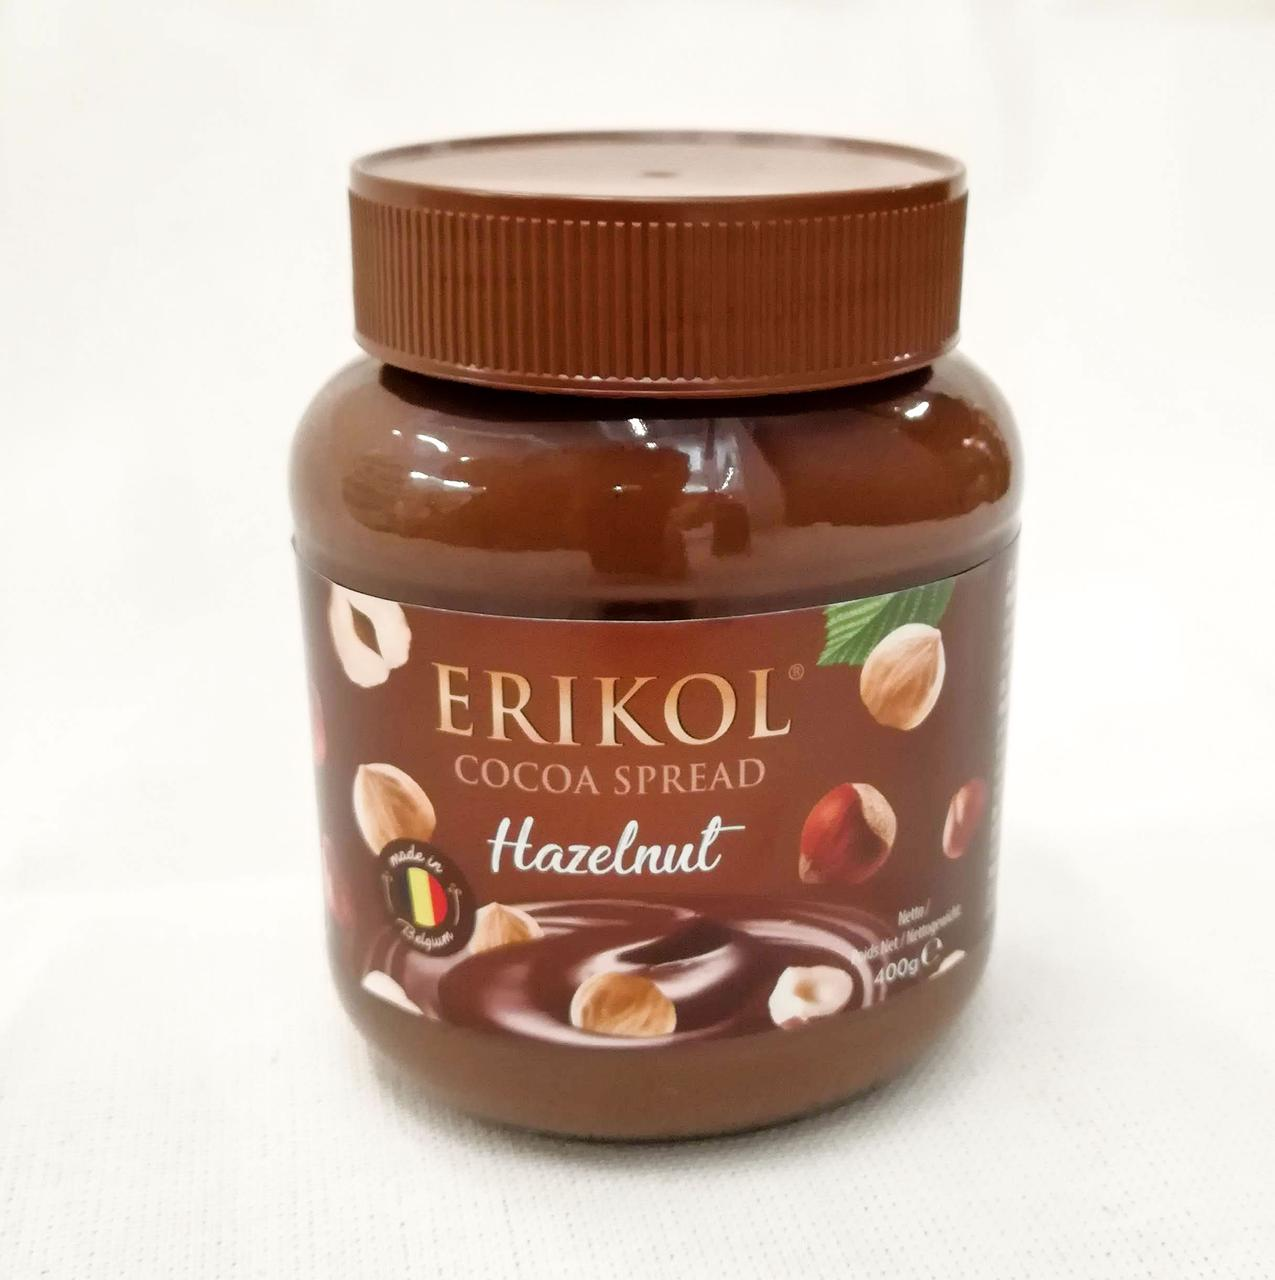 Erikol Cocoa Spread Hazelnut 400 gram